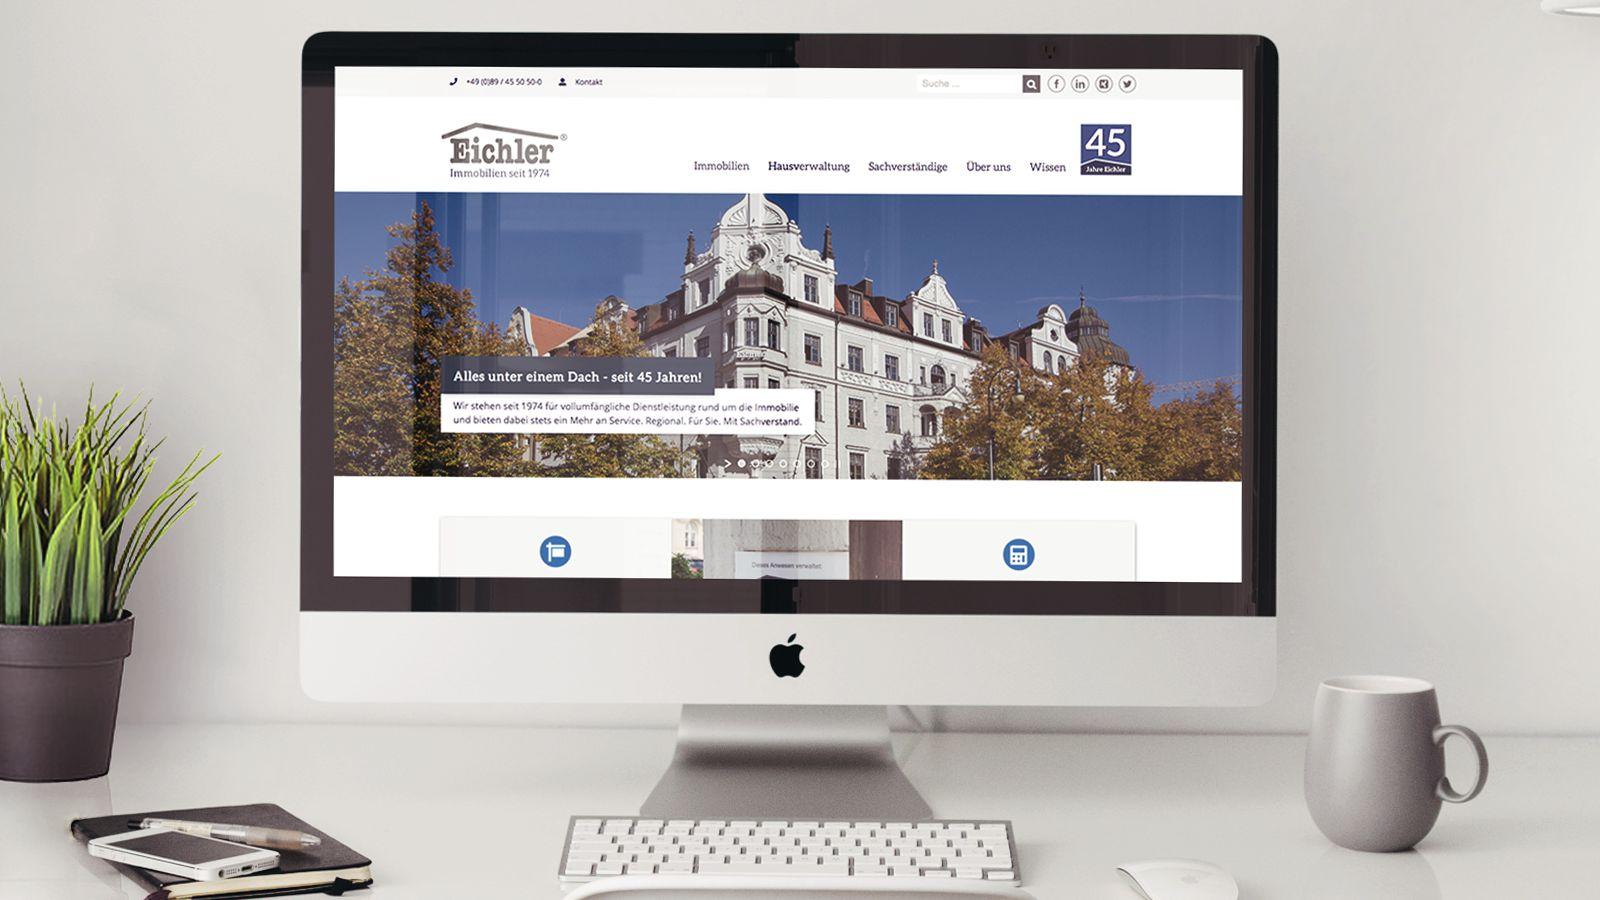 Webrelaunch | Eichler Immobilien